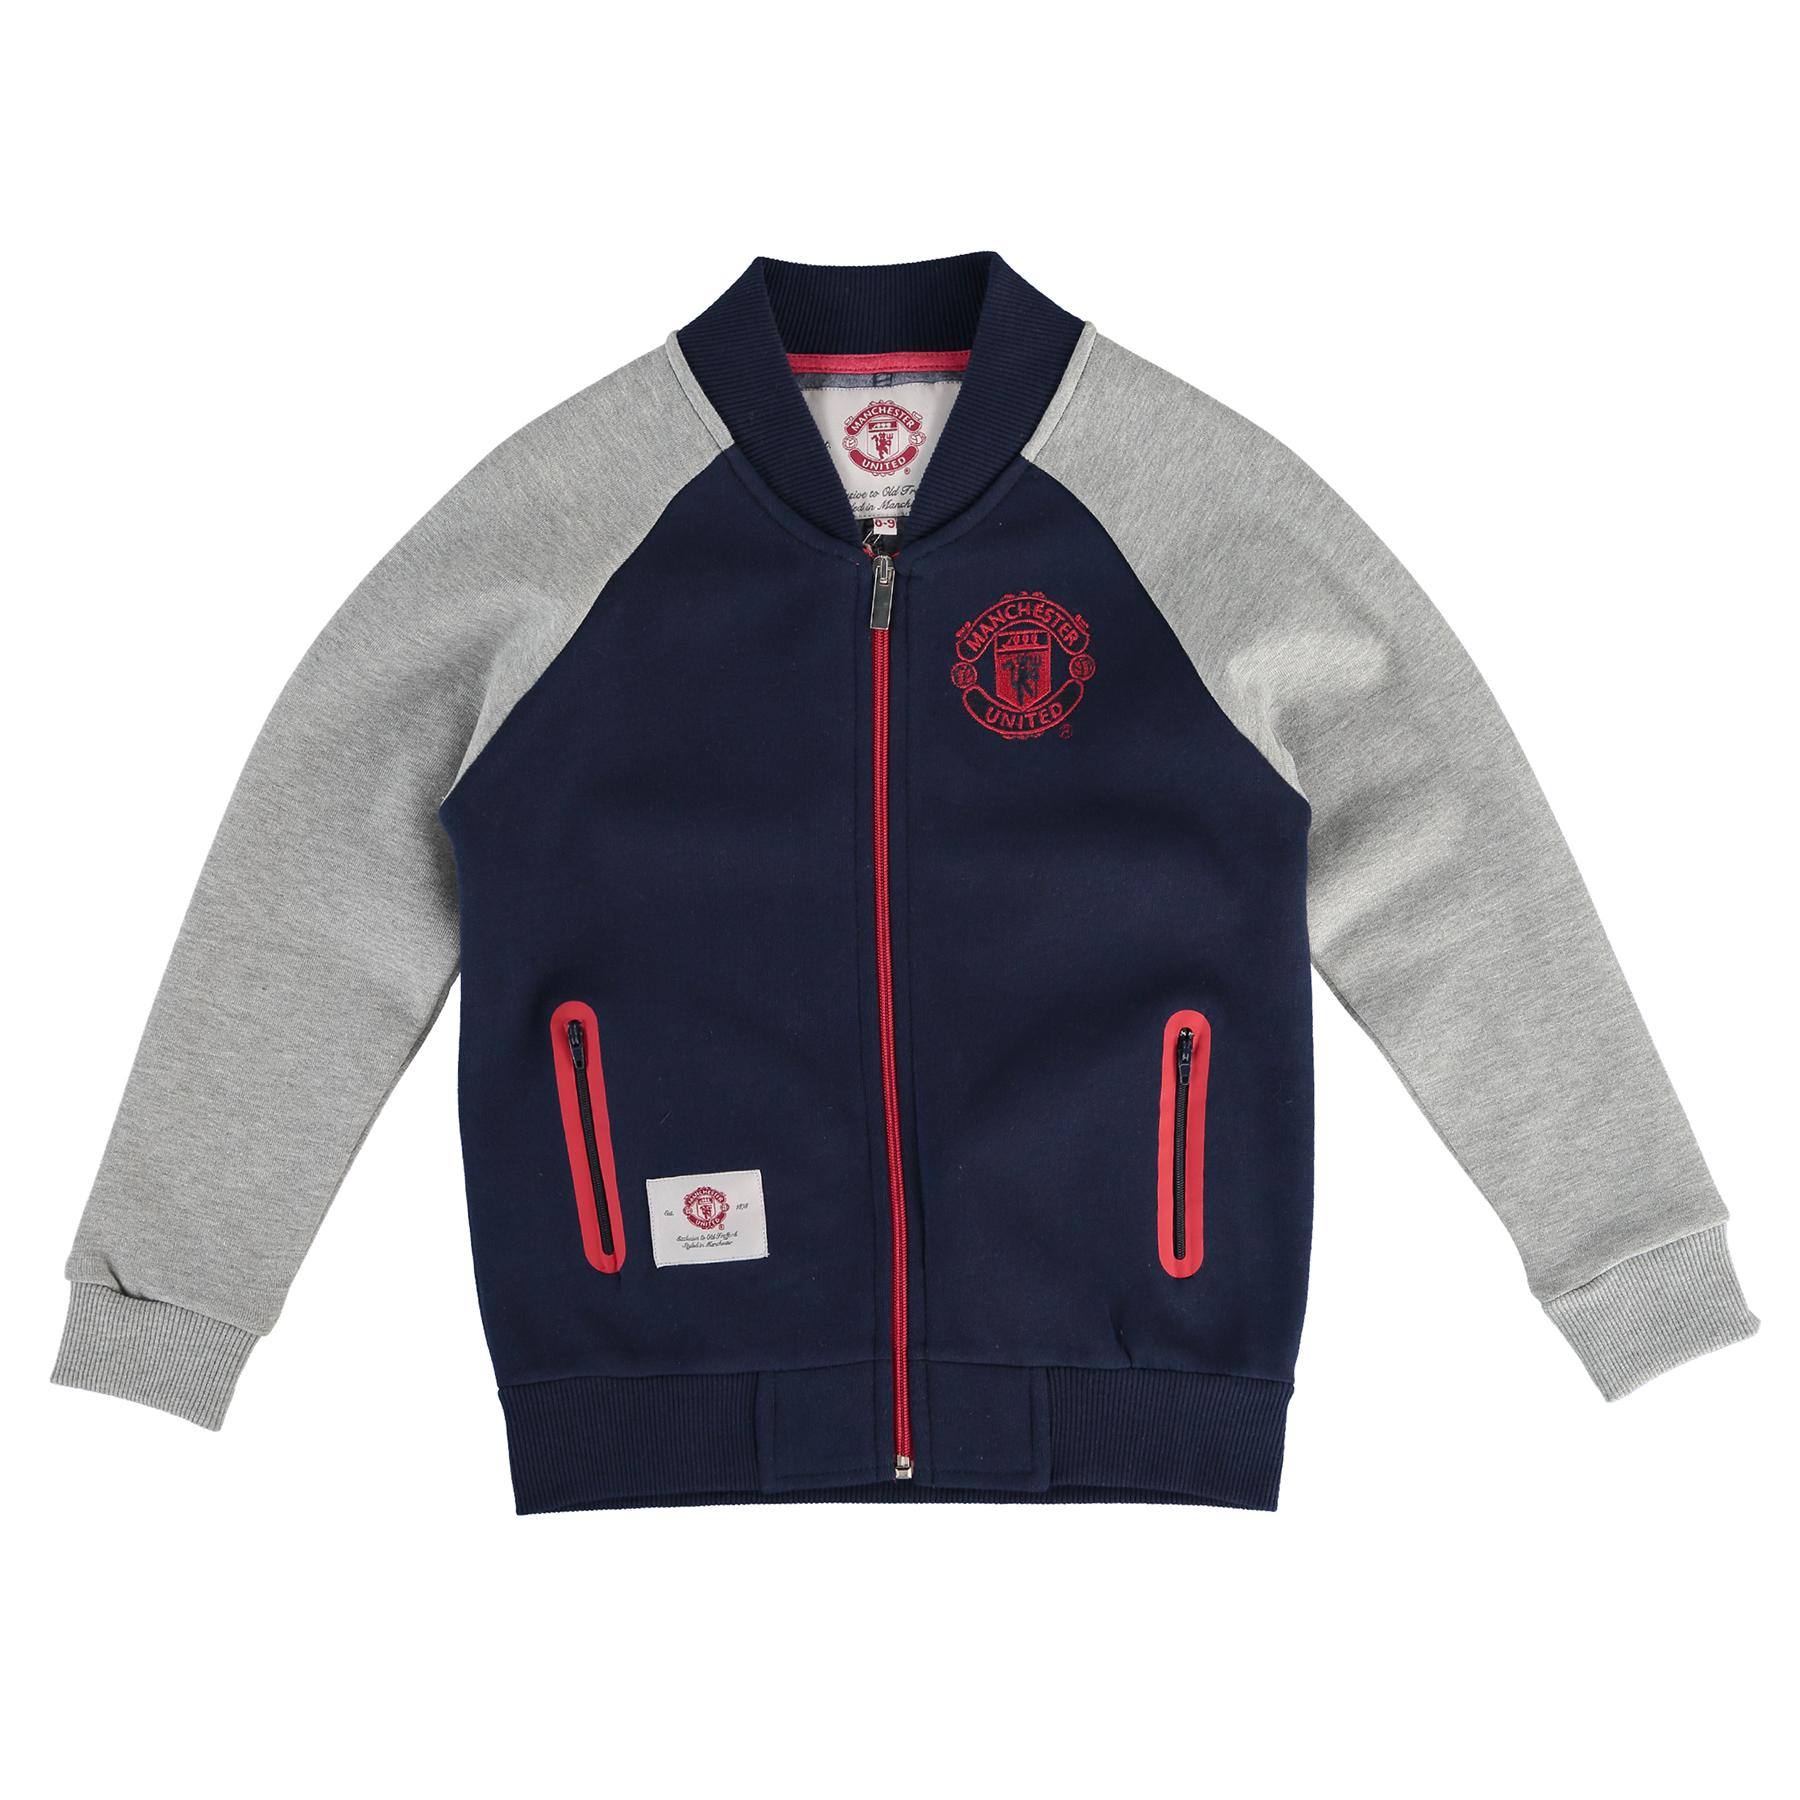 Manchester United Essential Baseball Jacket - Navy/Grey - Girls